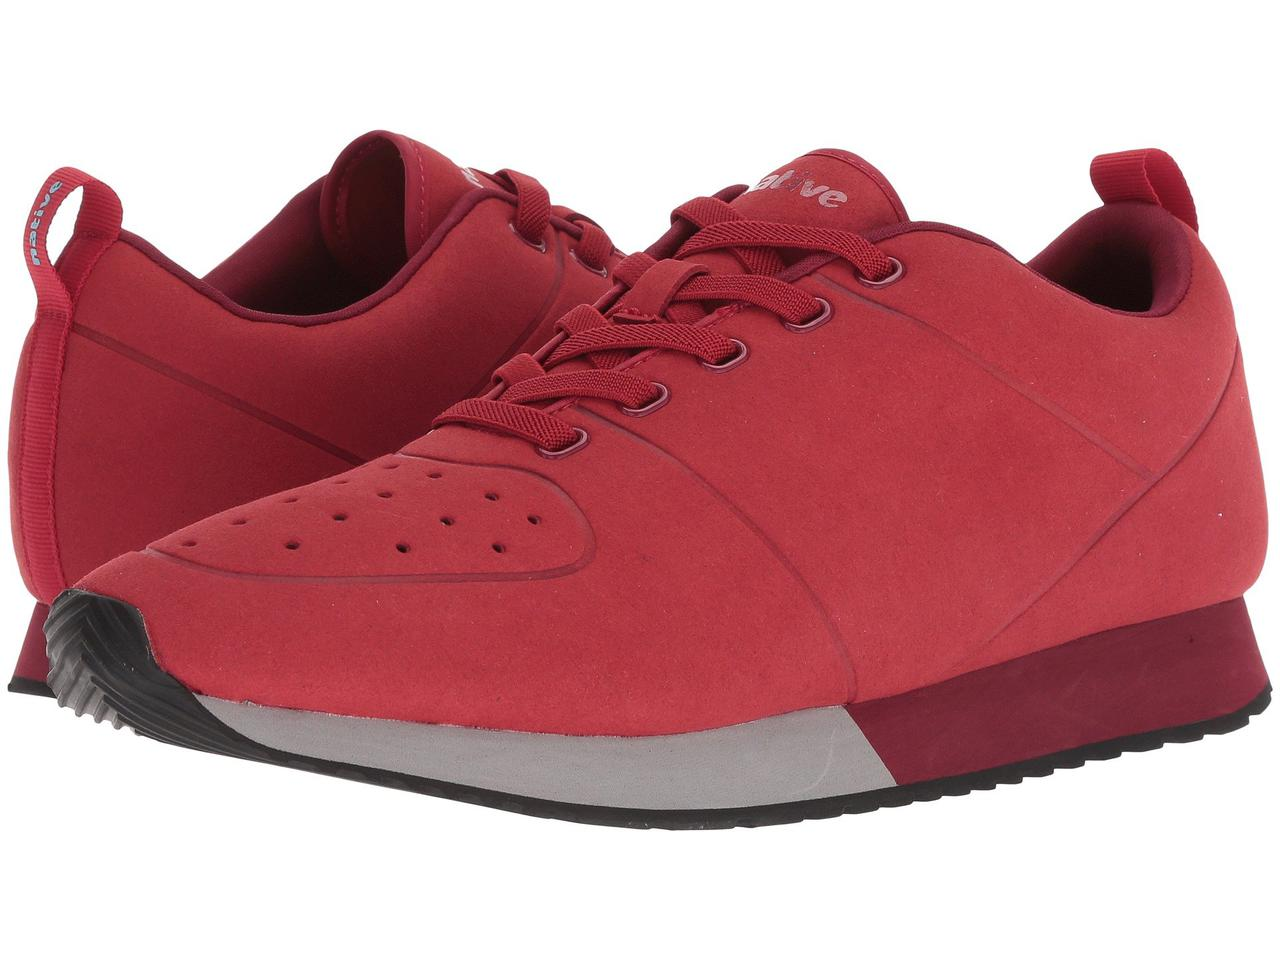 c1323cf17 Кроссовки/Кеды (Оригинал) Native Shoes Cornell Ski Patrol Red/Pigeon Grey/